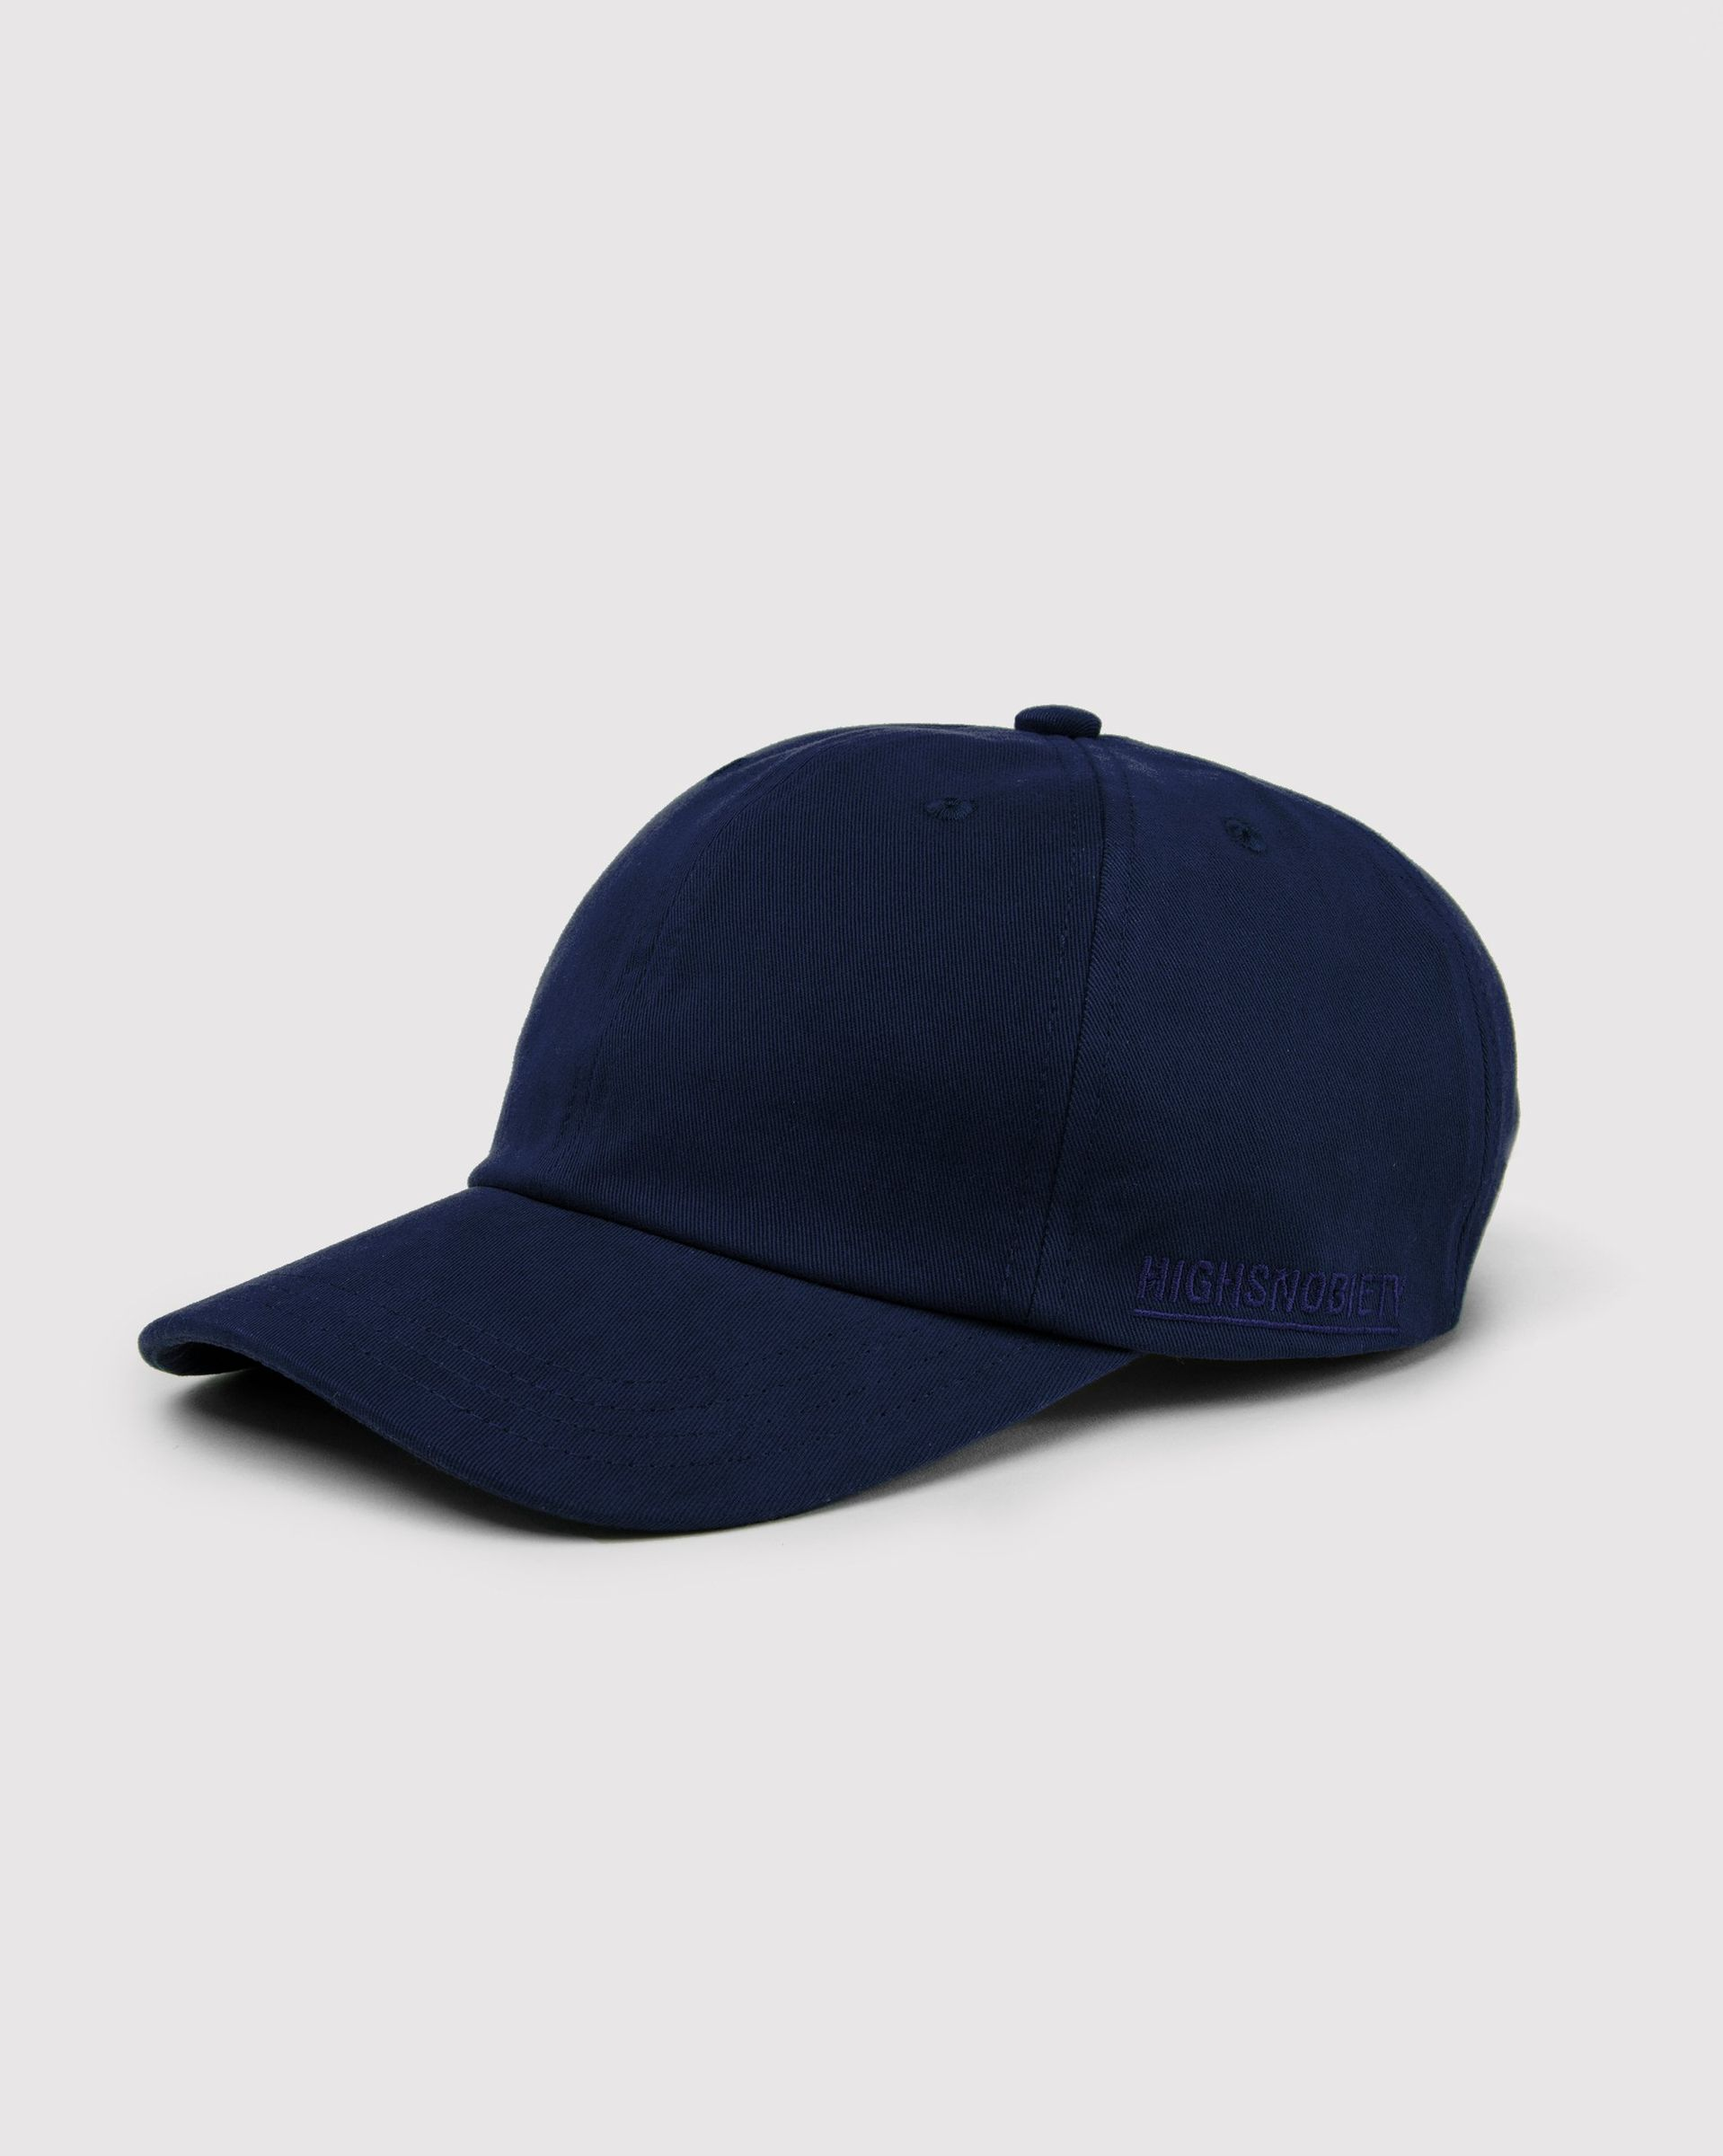 Highsnobiety Staples - Cap Navy - Image 1